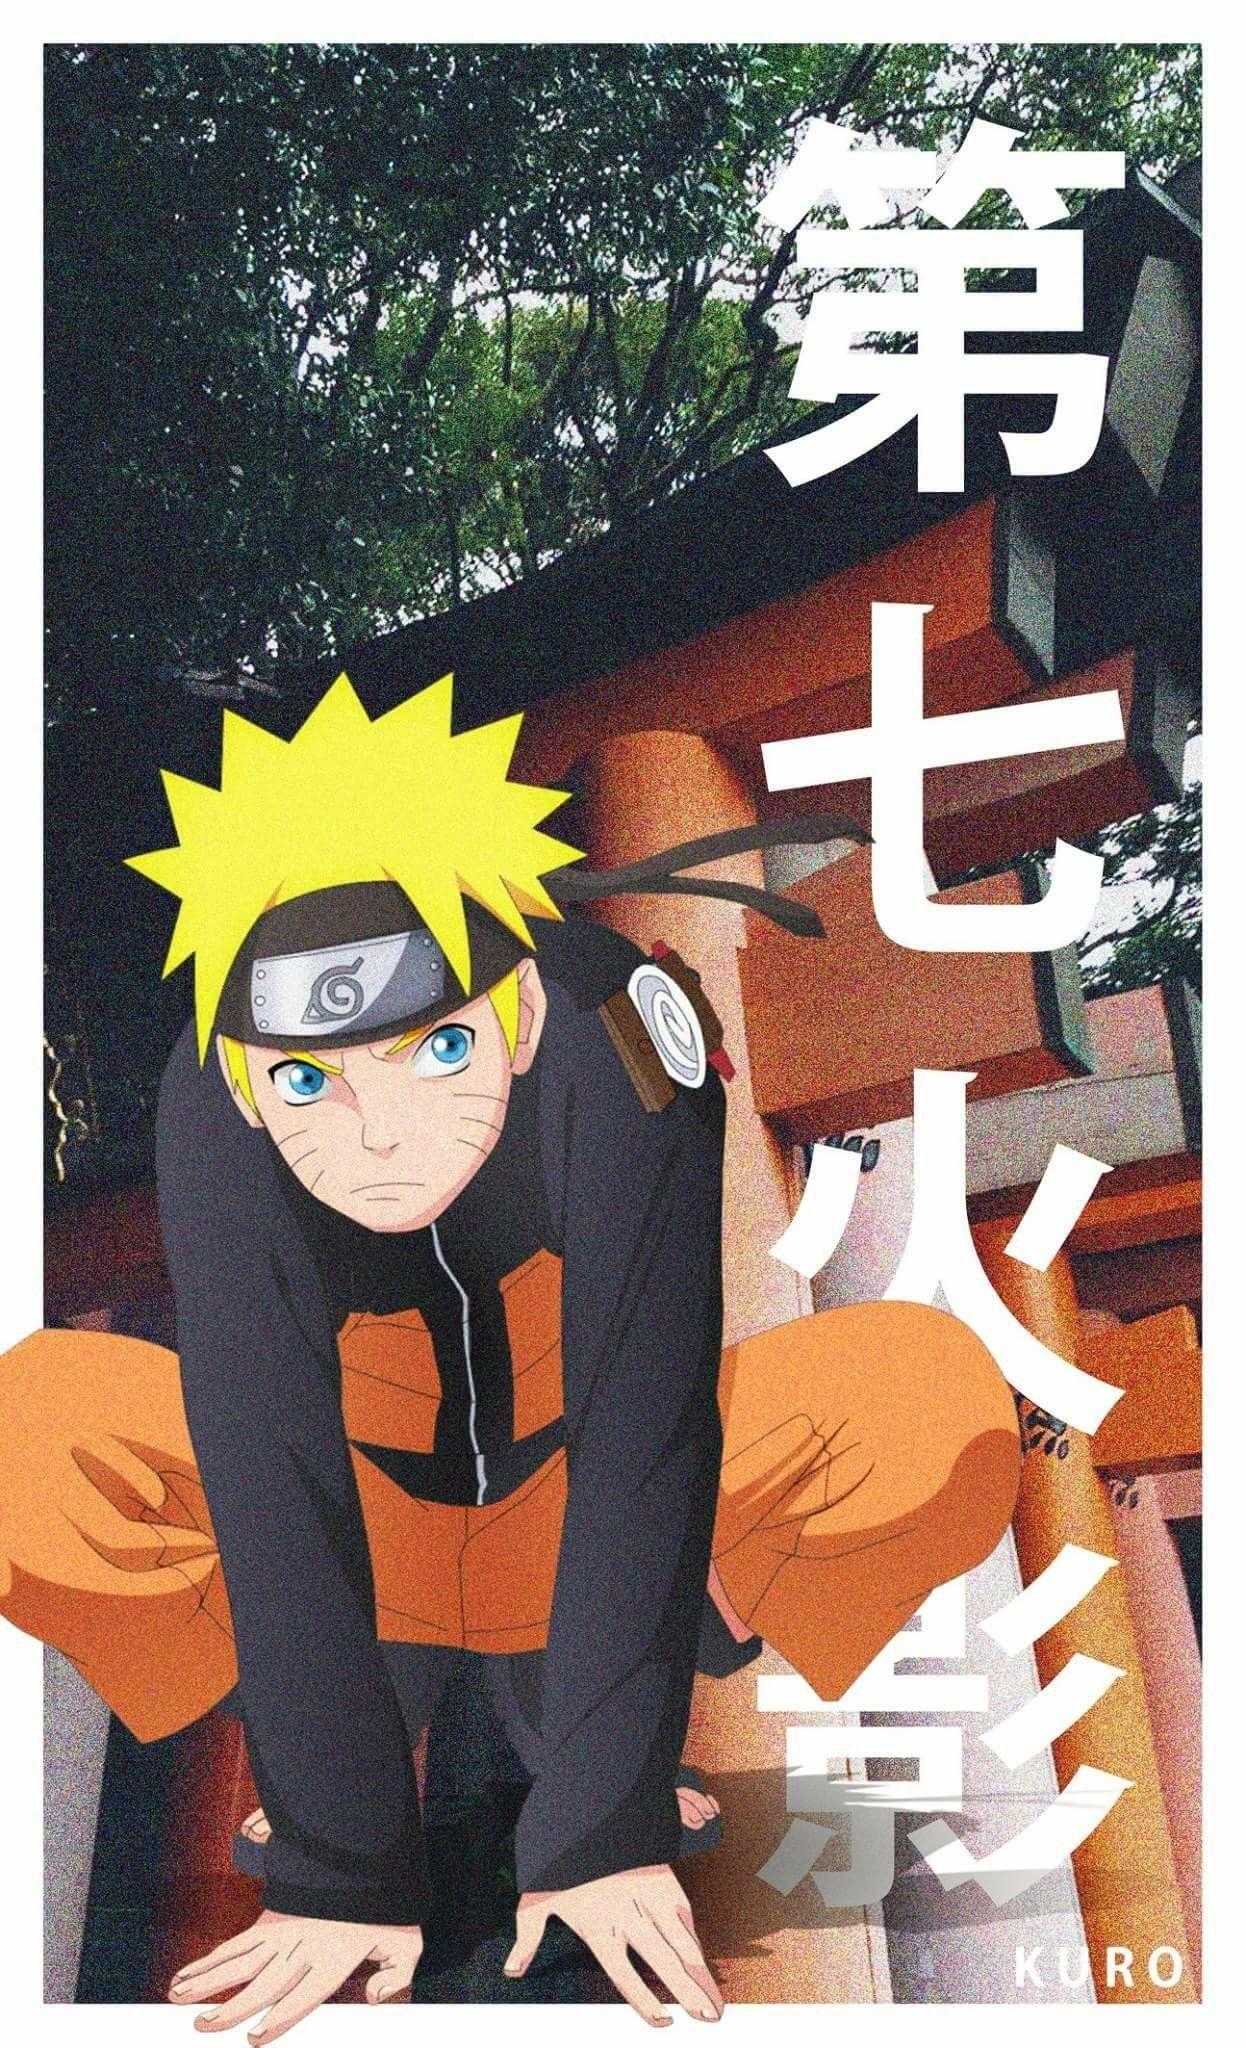 List Of Nice Anime Wallpaper Iphone 7 Plus Hokage Naruto Wallpaper Mobile Naruto And Minato In 2020 Anime Wallpaper Iphone Naruto Wallpaper Android Wallpaper Anime